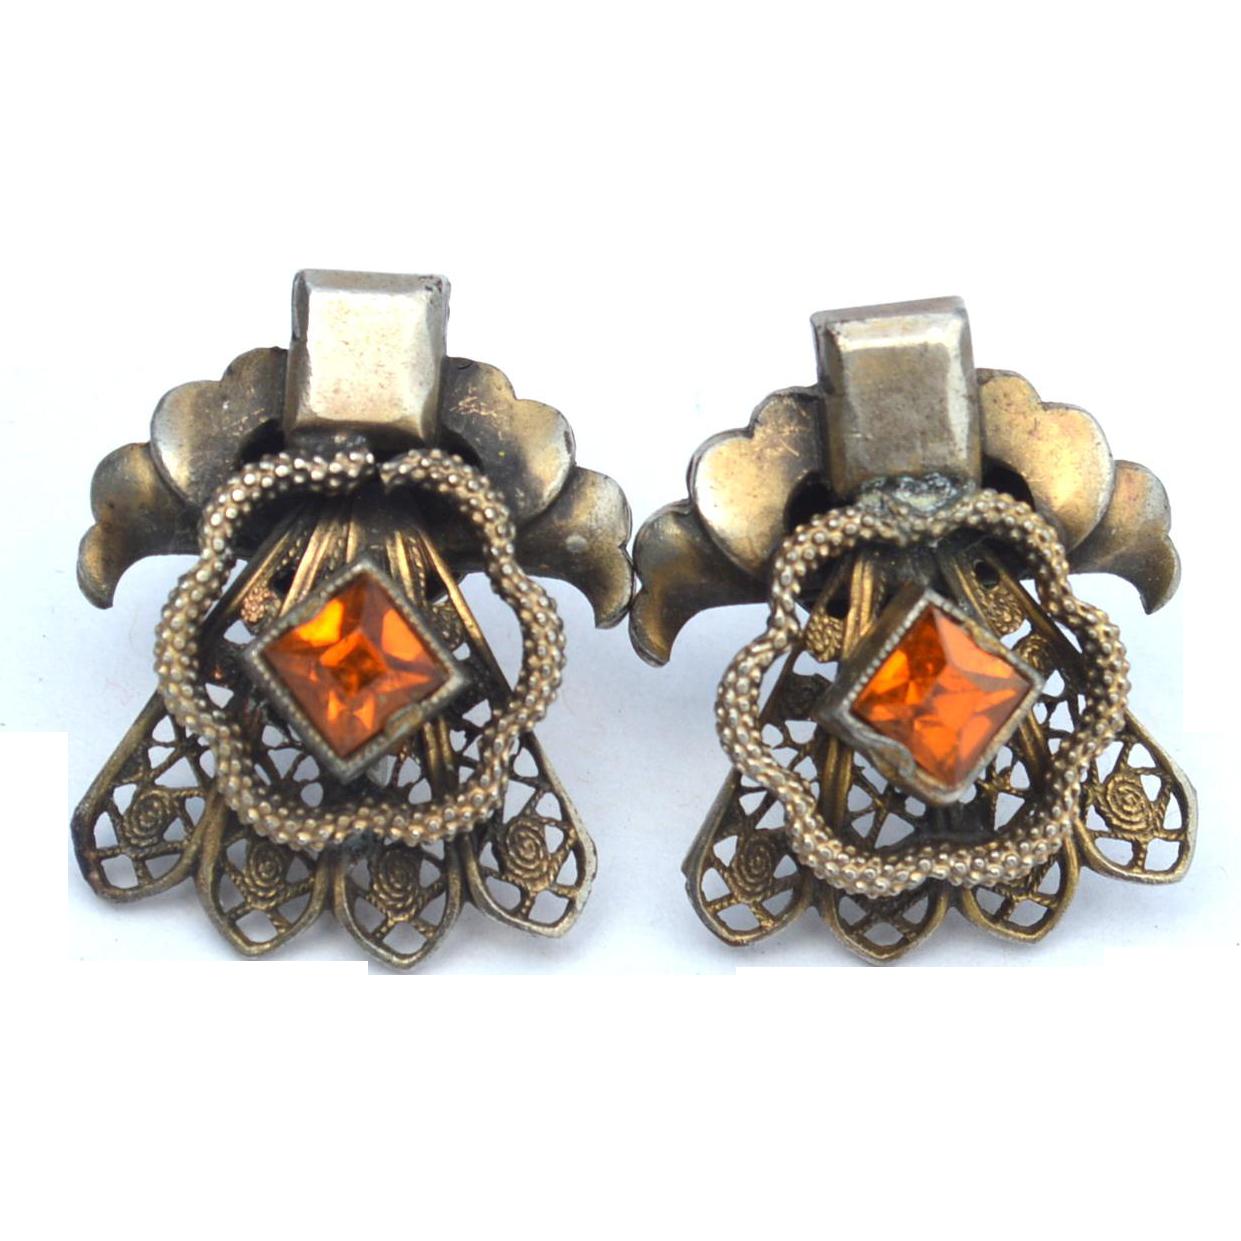 Early Diamond Shape Citrine Colored Rhinestone Paste Earrings, Very Ornate